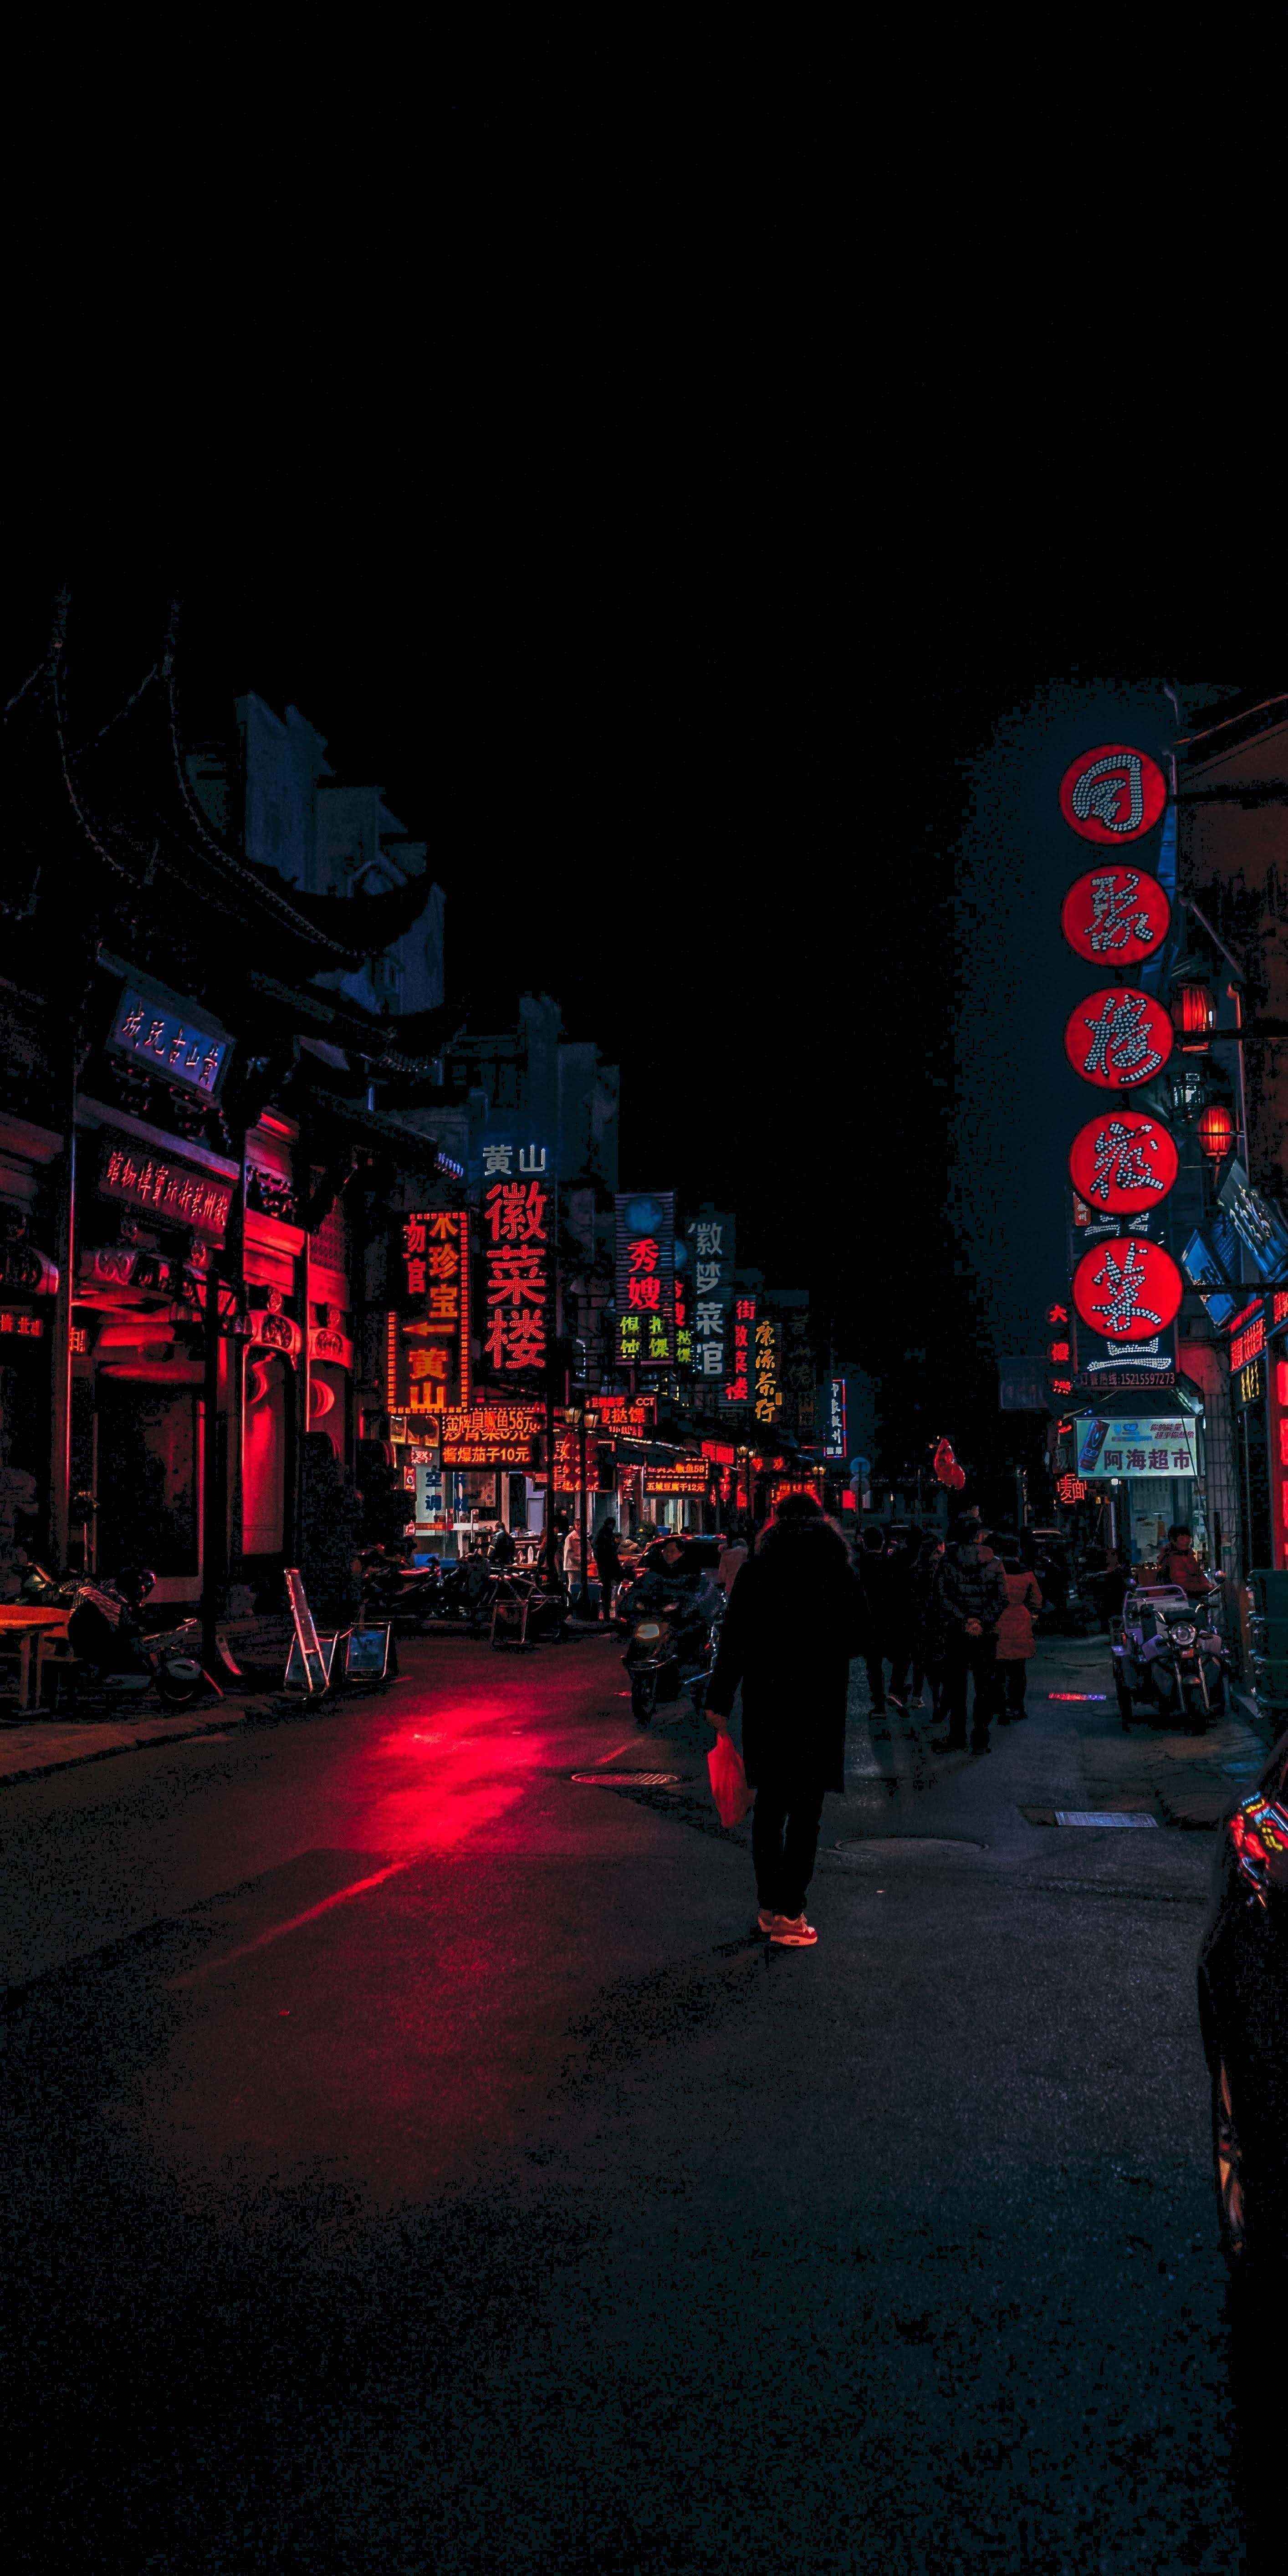 Cyberpunk Amoled Dark Vertical 5k Wallpaper Hdwallpaper Desktop Landscape Wallpaper City Wallpaper City Aesthetic